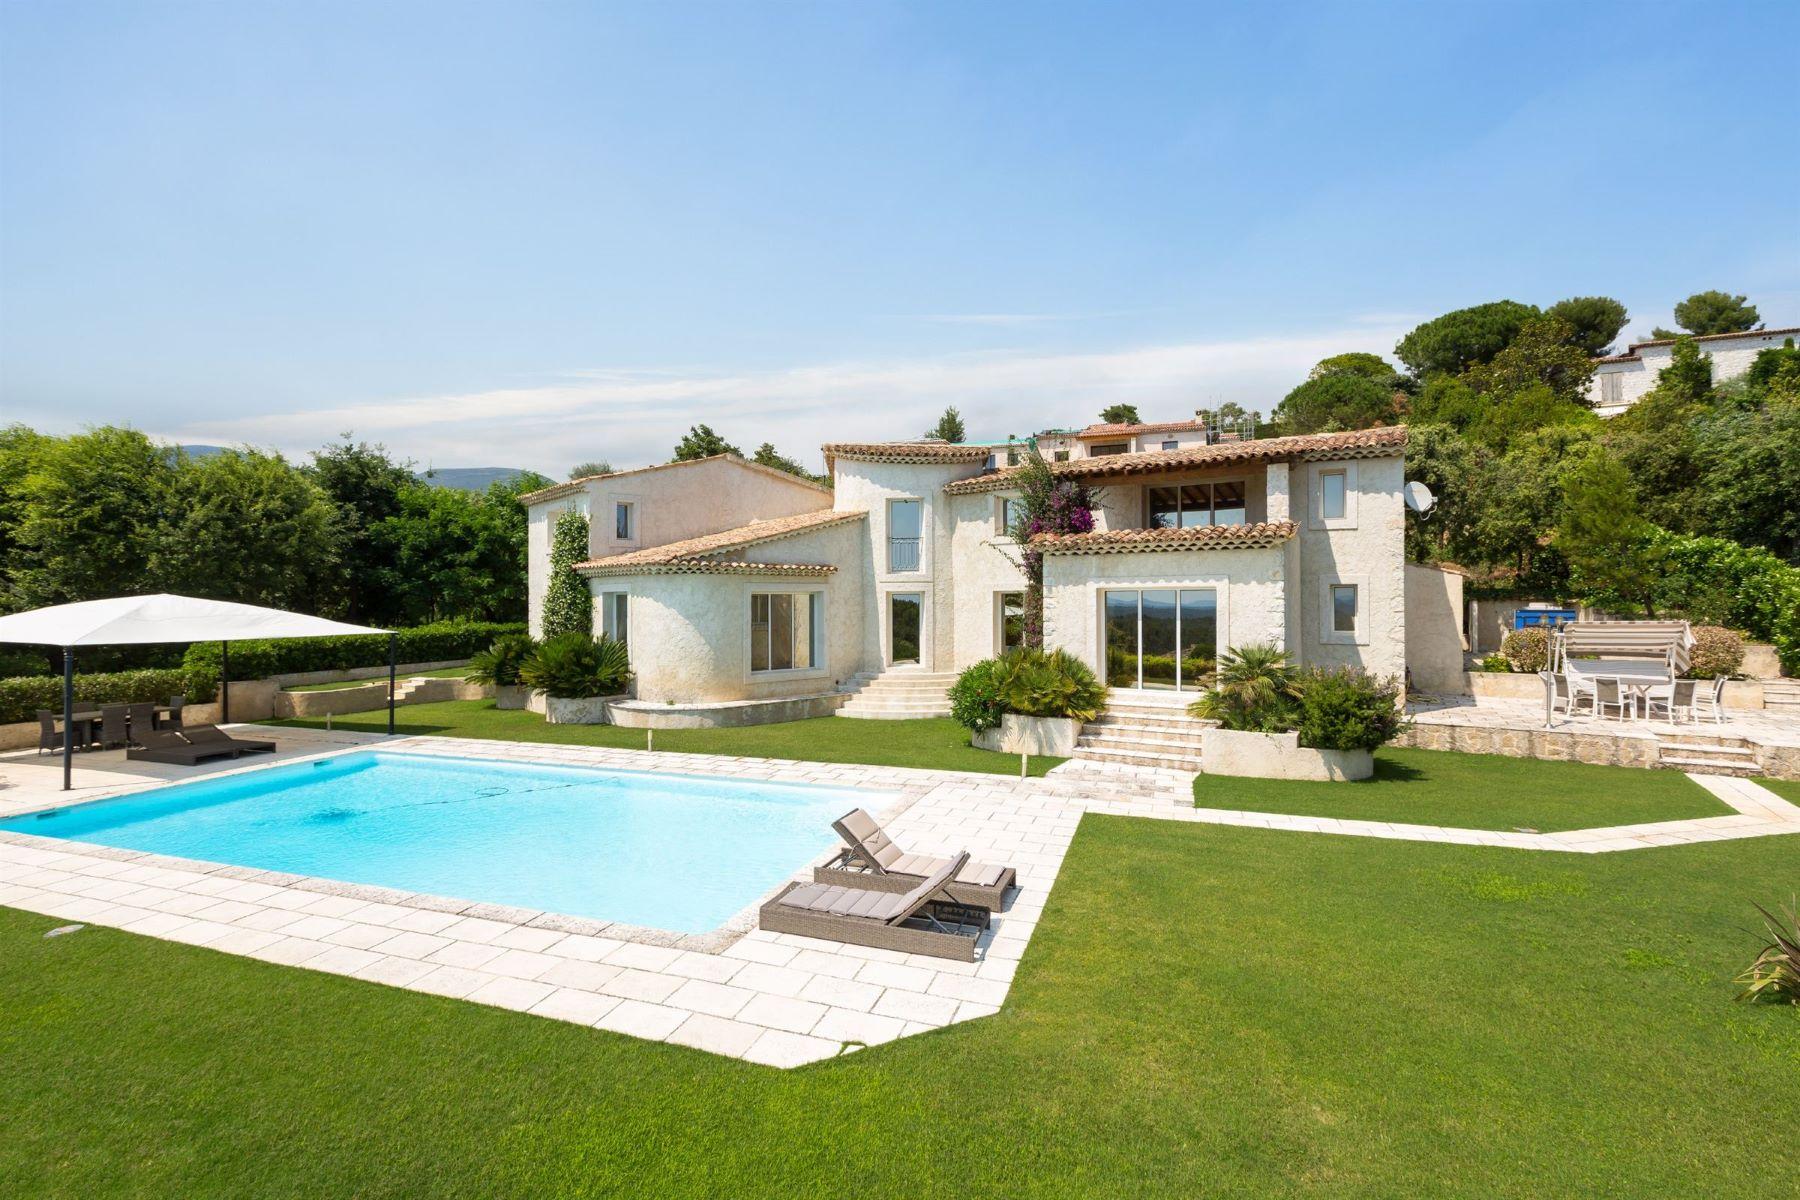 Single Family Homes por un Venta en Panoramic sea views in a prestigious Domain in Saint-Paul-de-Vence Other Provence-Alpes-Cote D'Azur, Provincia - Alpes - Costa Azul 06570 Francia